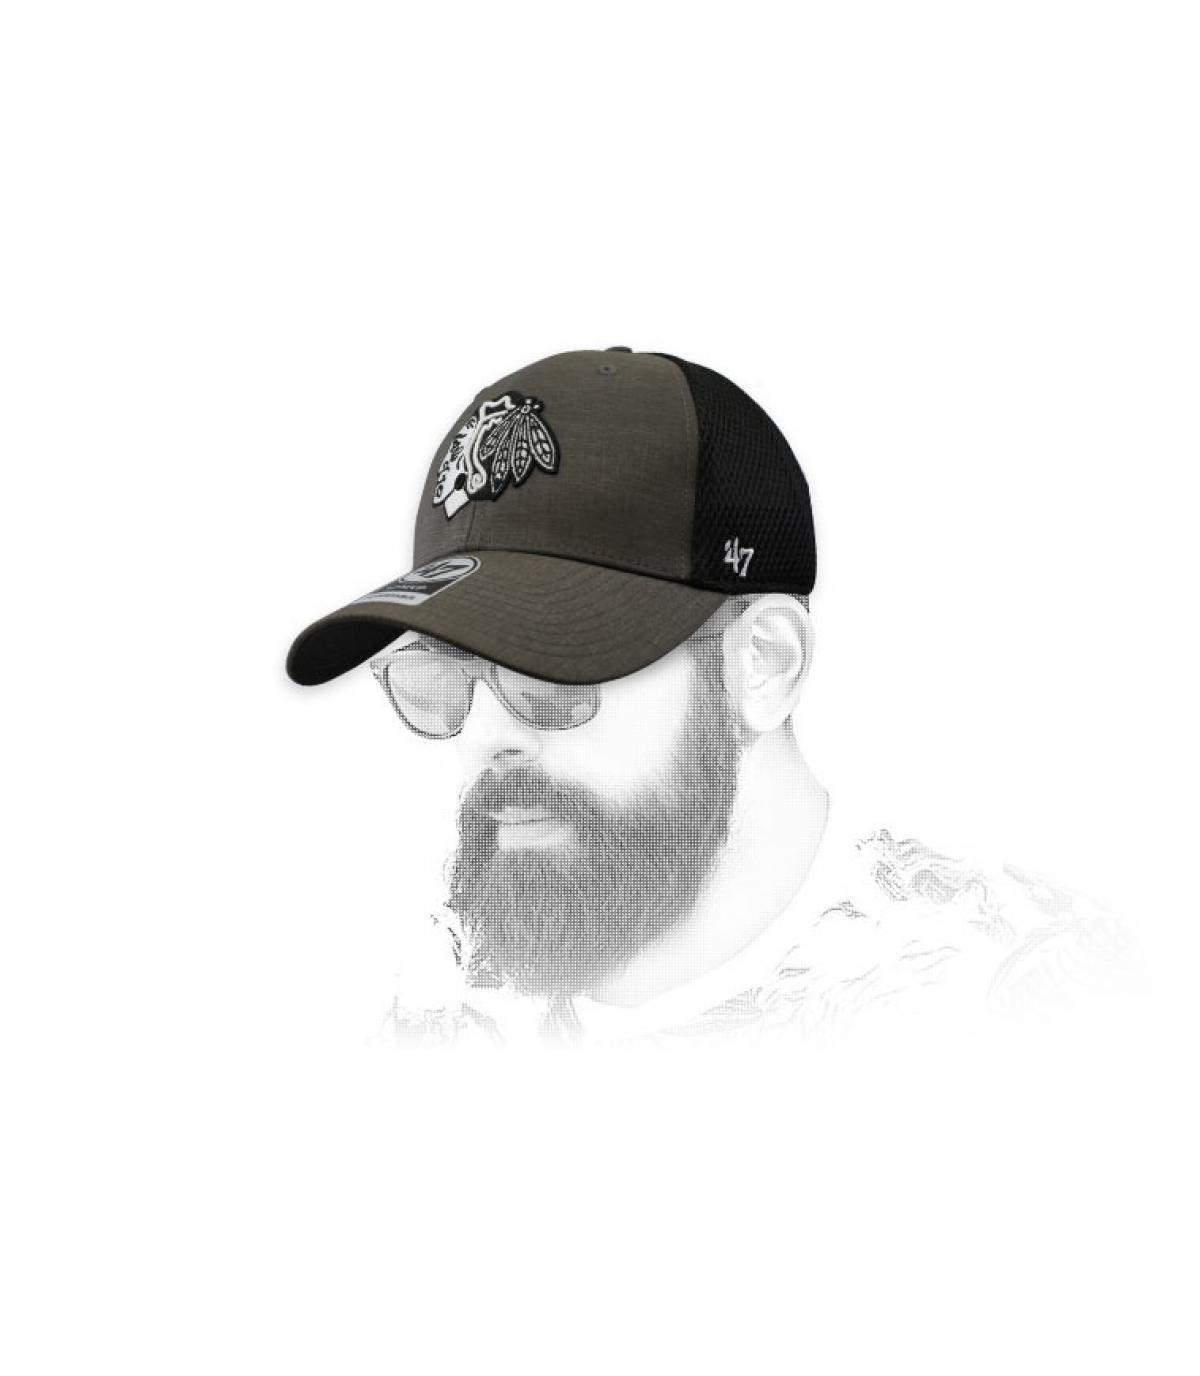 Cap Blackhawks grau schwarz